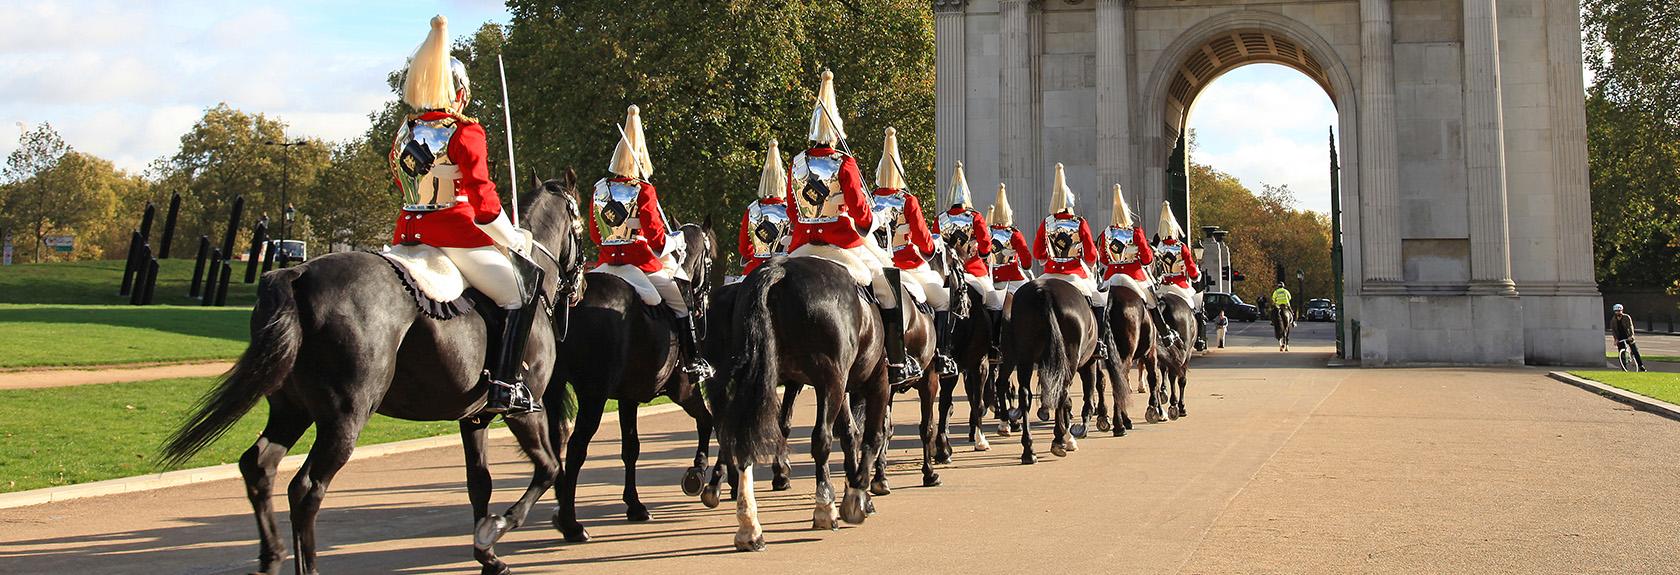 Wisseling van de wacht op Buckingham Palace